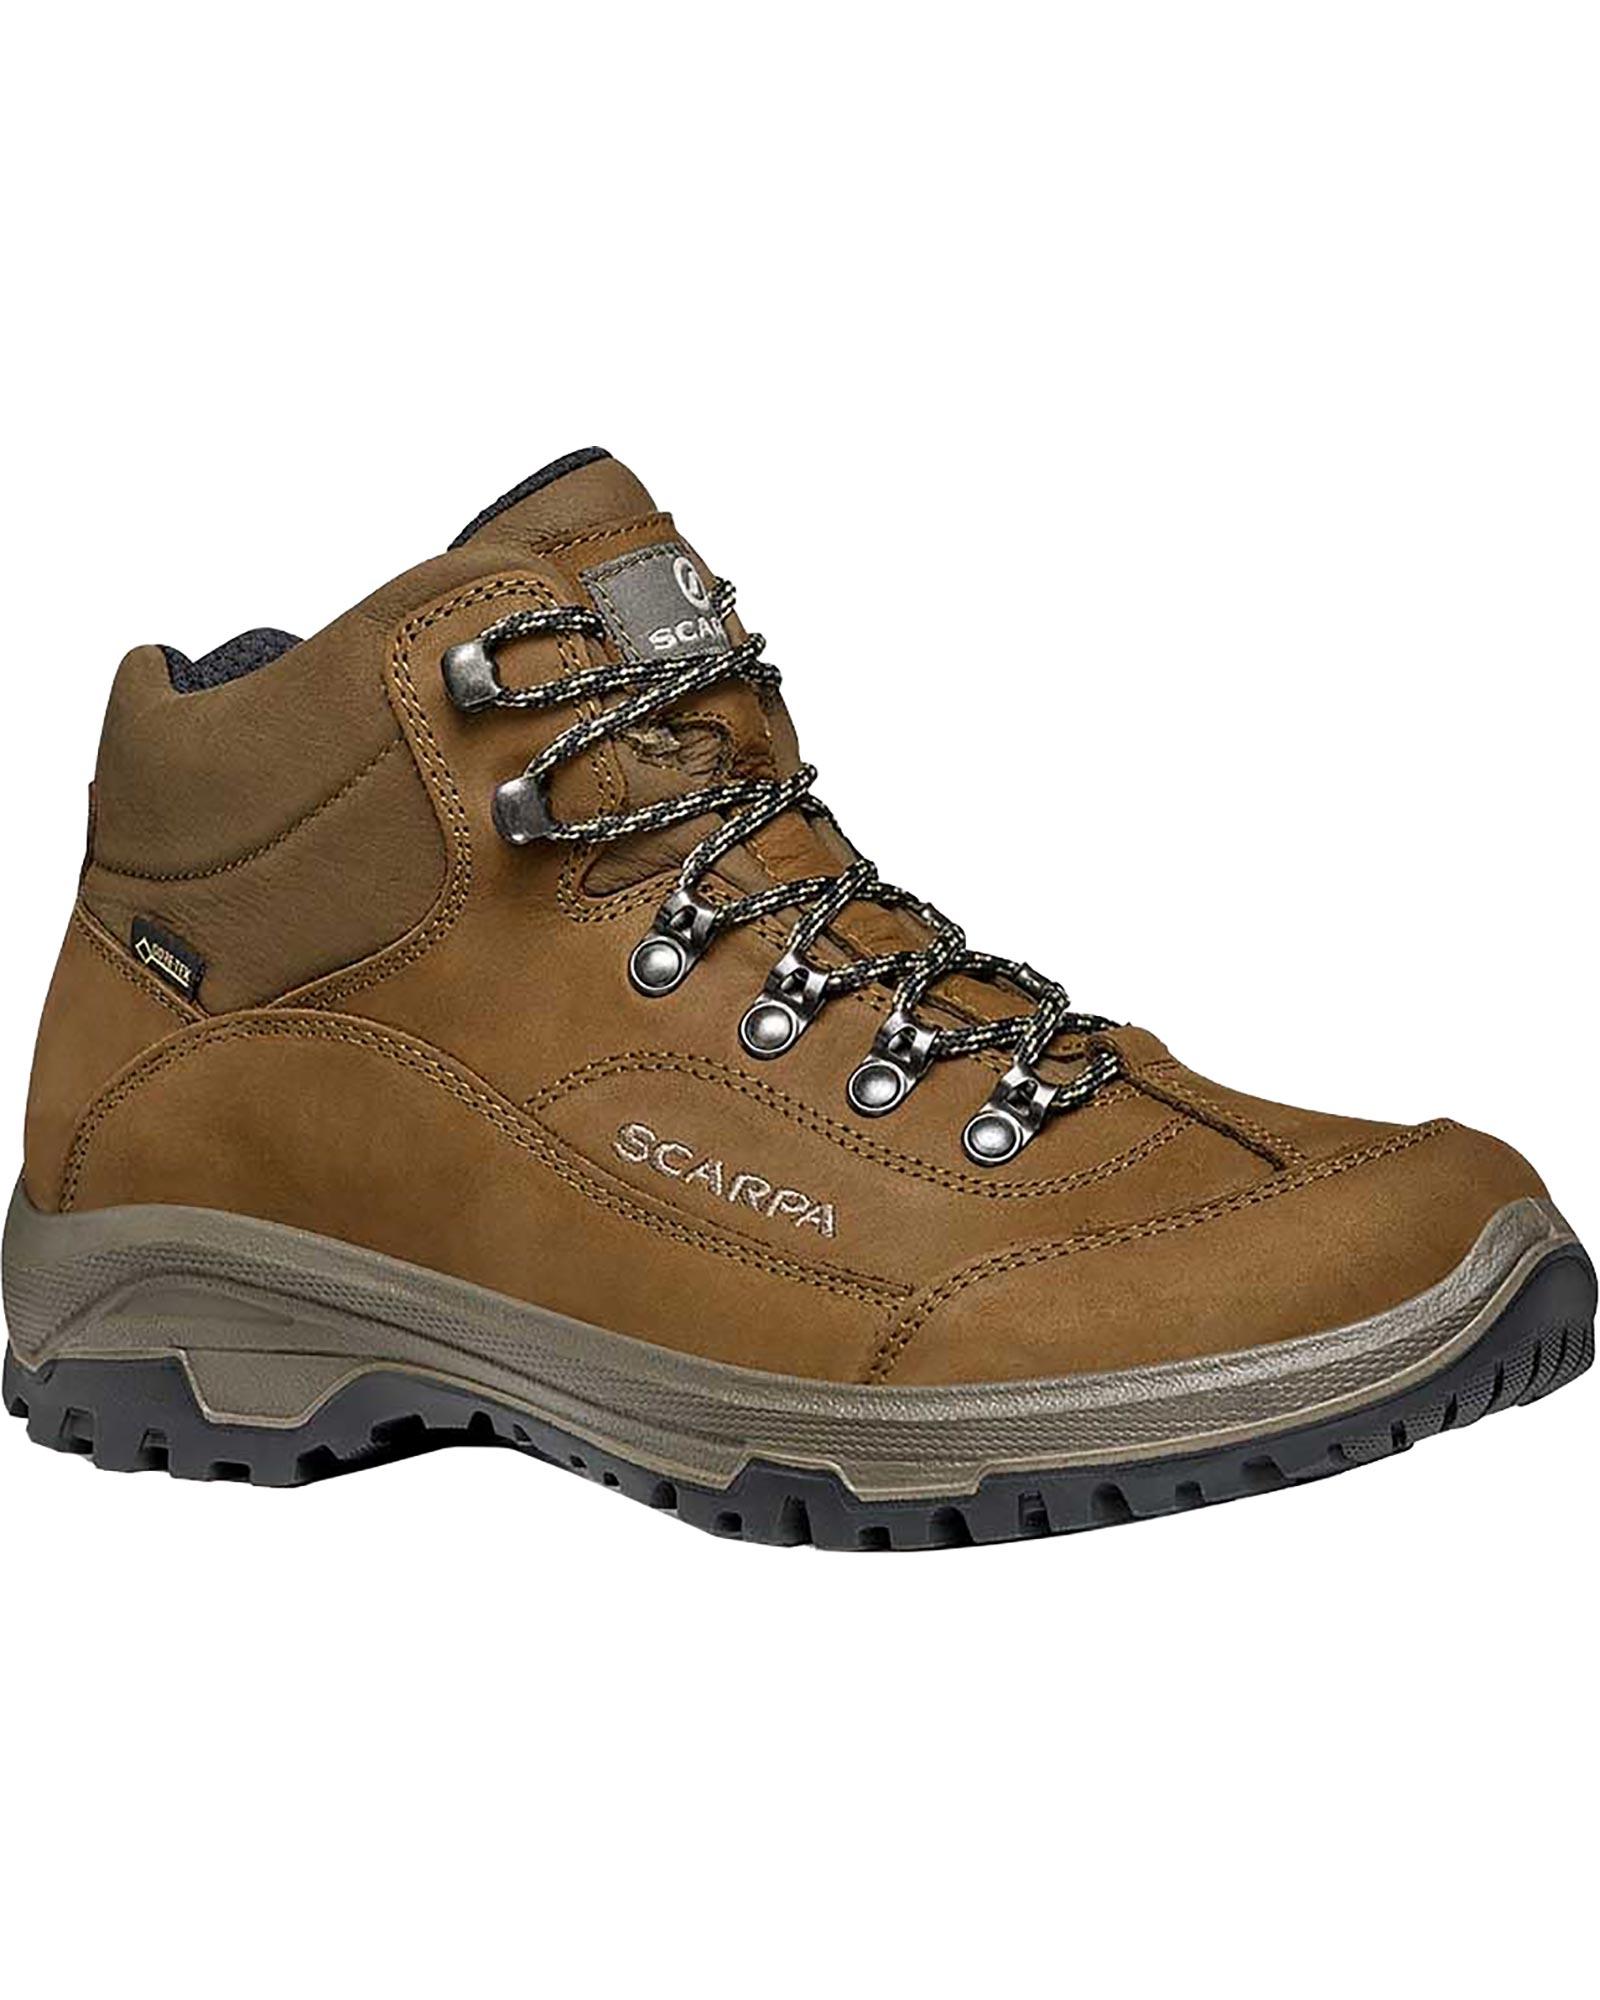 Scarpa Cyrus Mid GORE-TEX Men's Boots 0